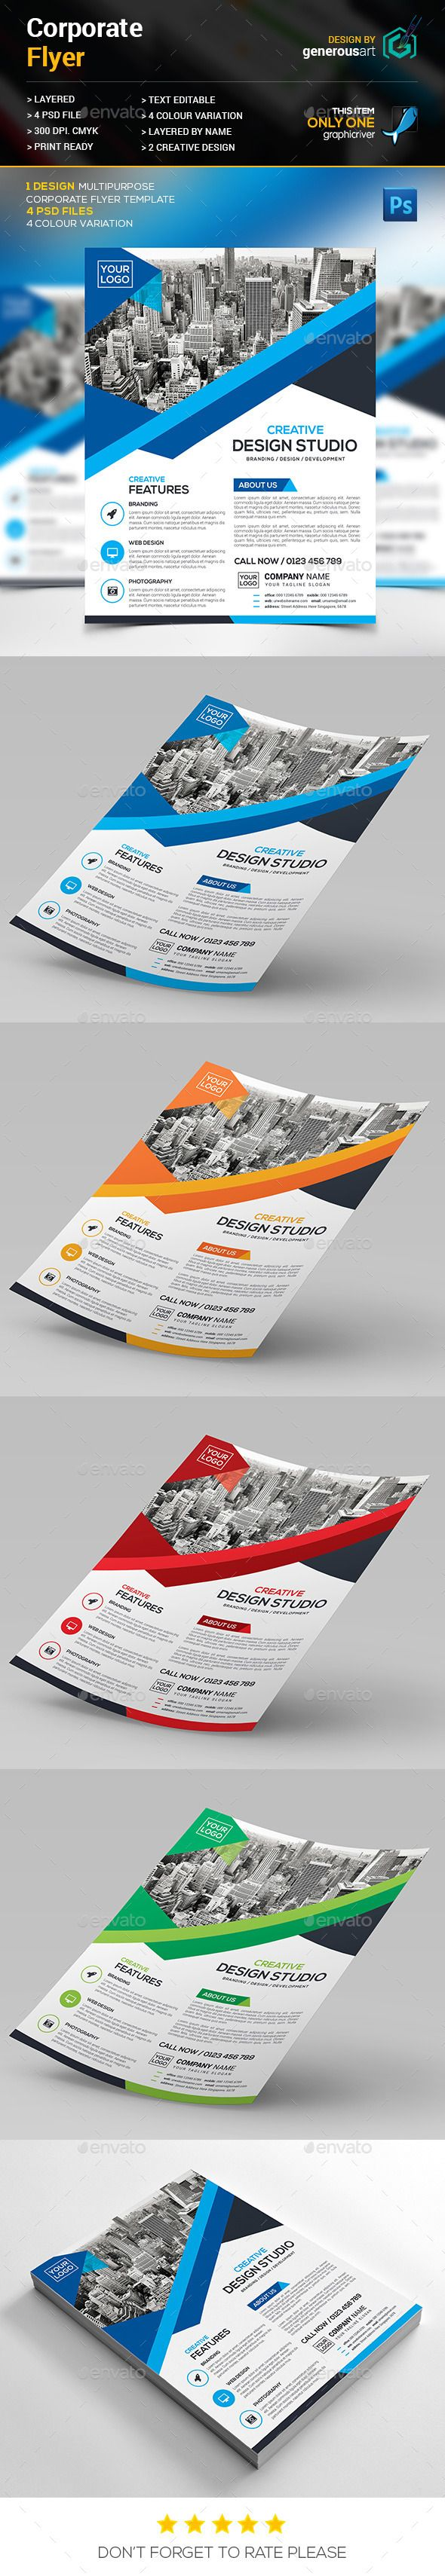 Corporate Flyer Template PSD #design Download: http://graphicriver.net/item/corporate-flyer/13226768?ref=ksioks